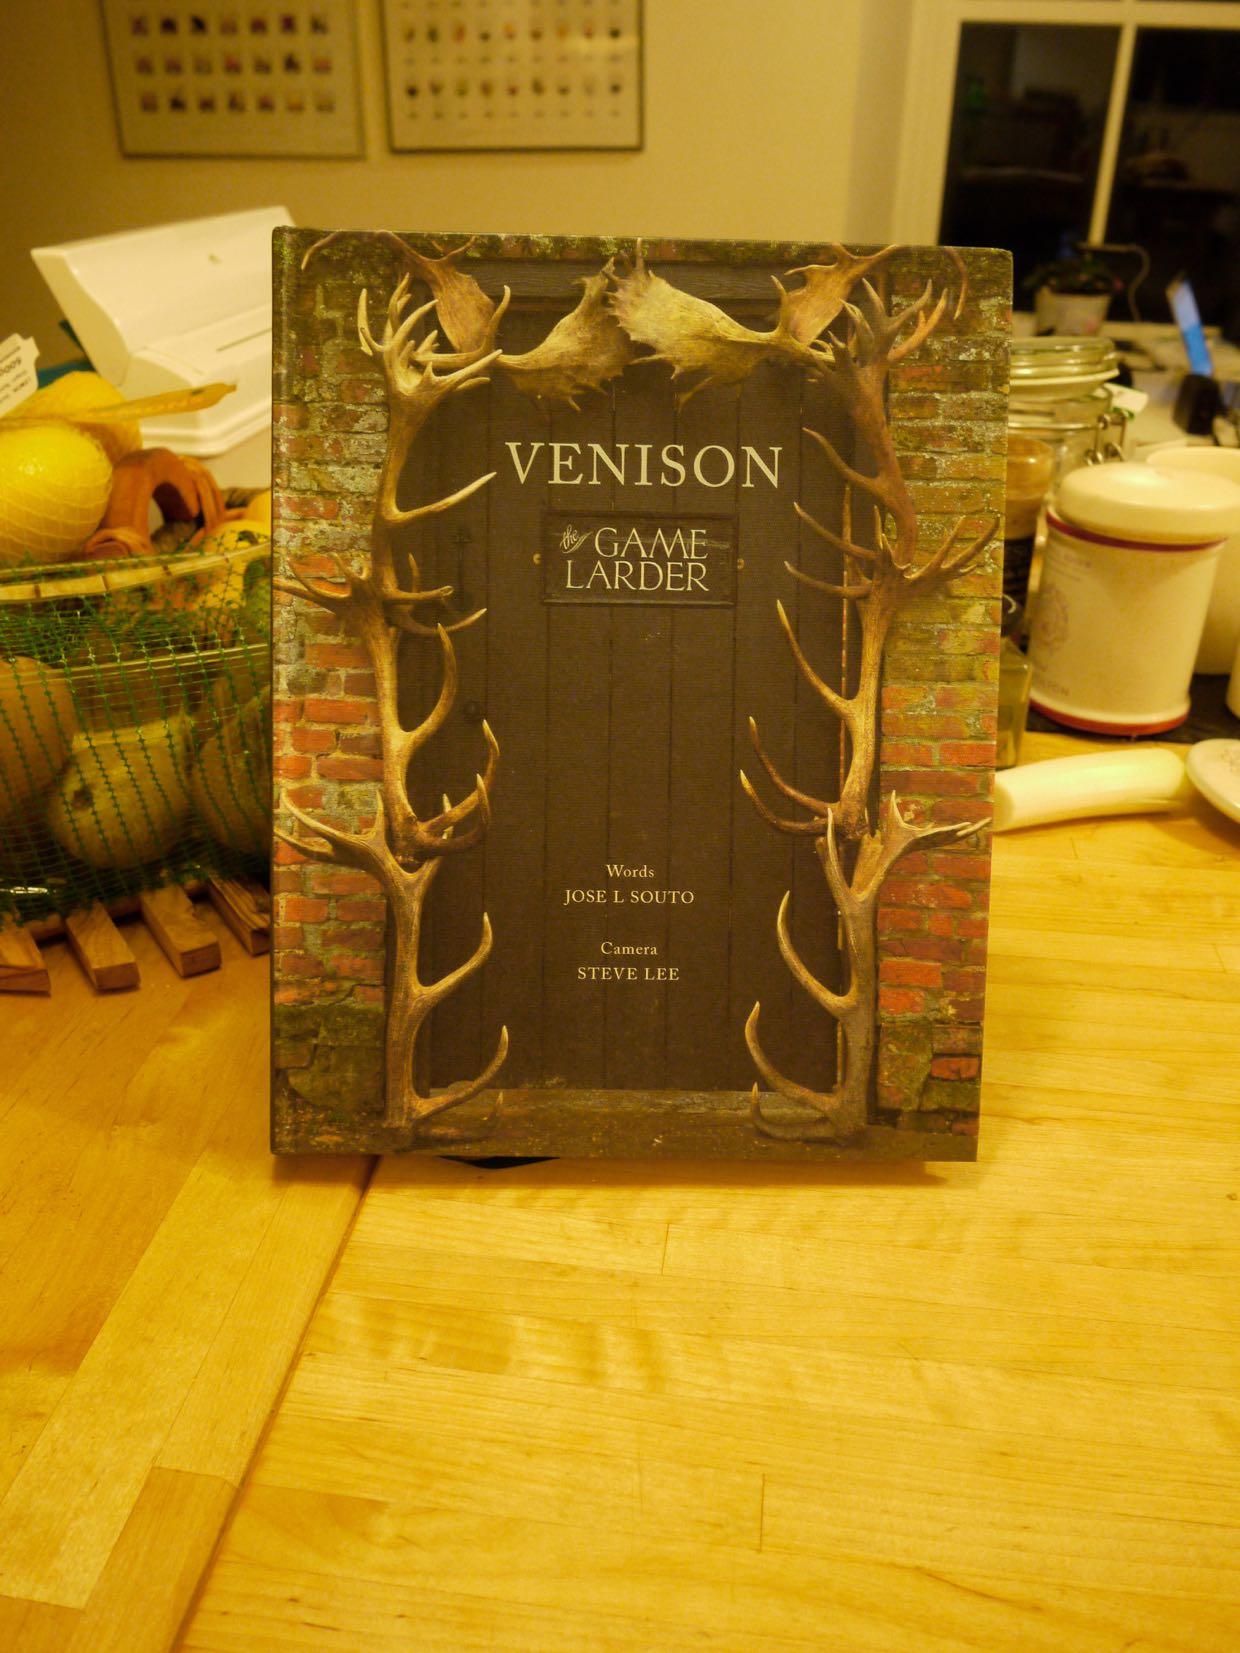 The Best Venison Book Yet